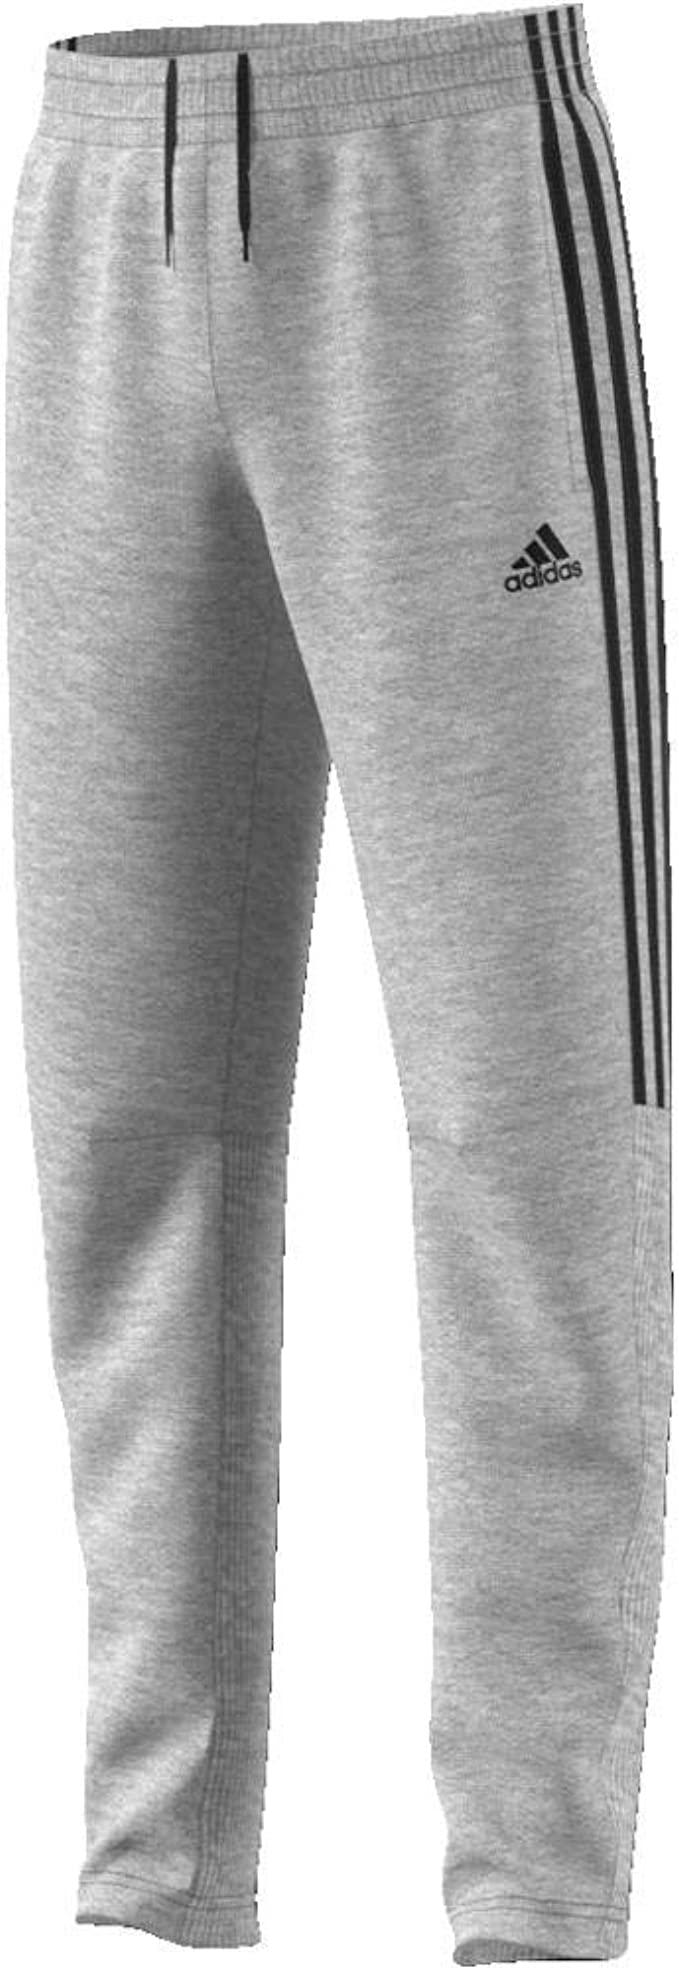 adidas Performance Trainingshose »Must Haves 3 Streifen Tiro Hose« Must Haves online kaufen | OTTO